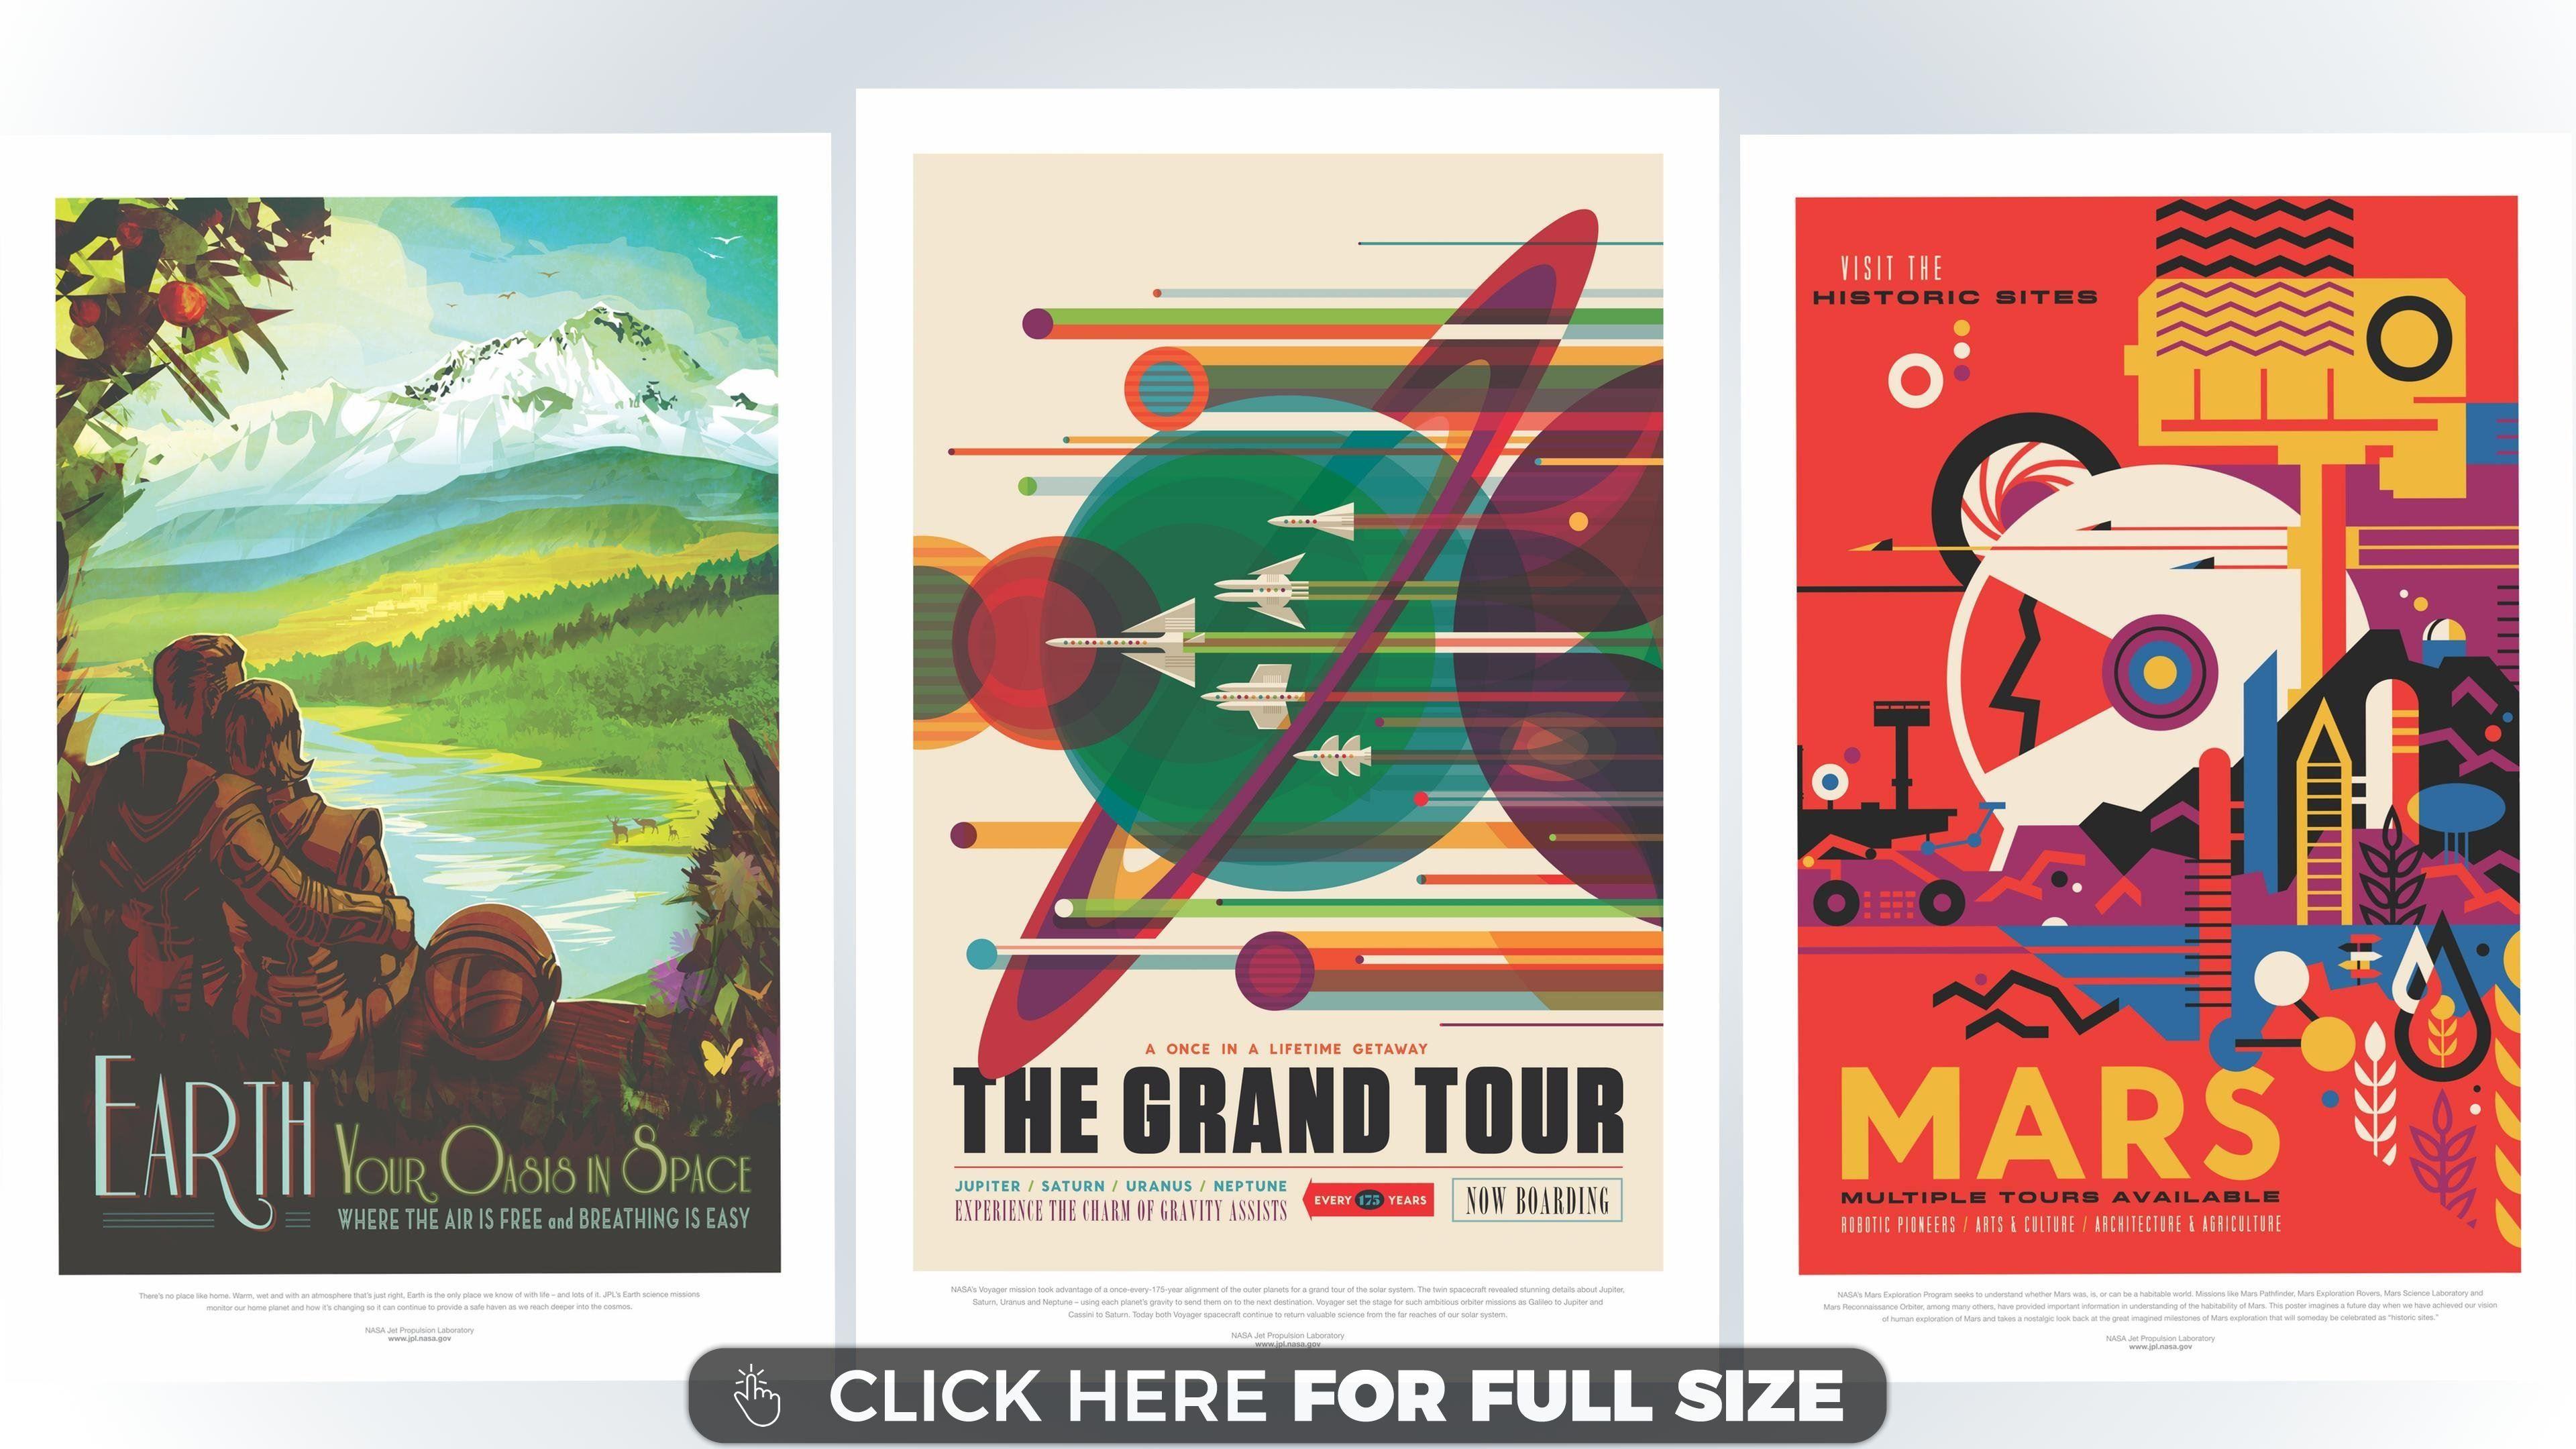 Nasa The Grand Tour Nasa Travel Posters Space Travel Posters Posters Art Prints